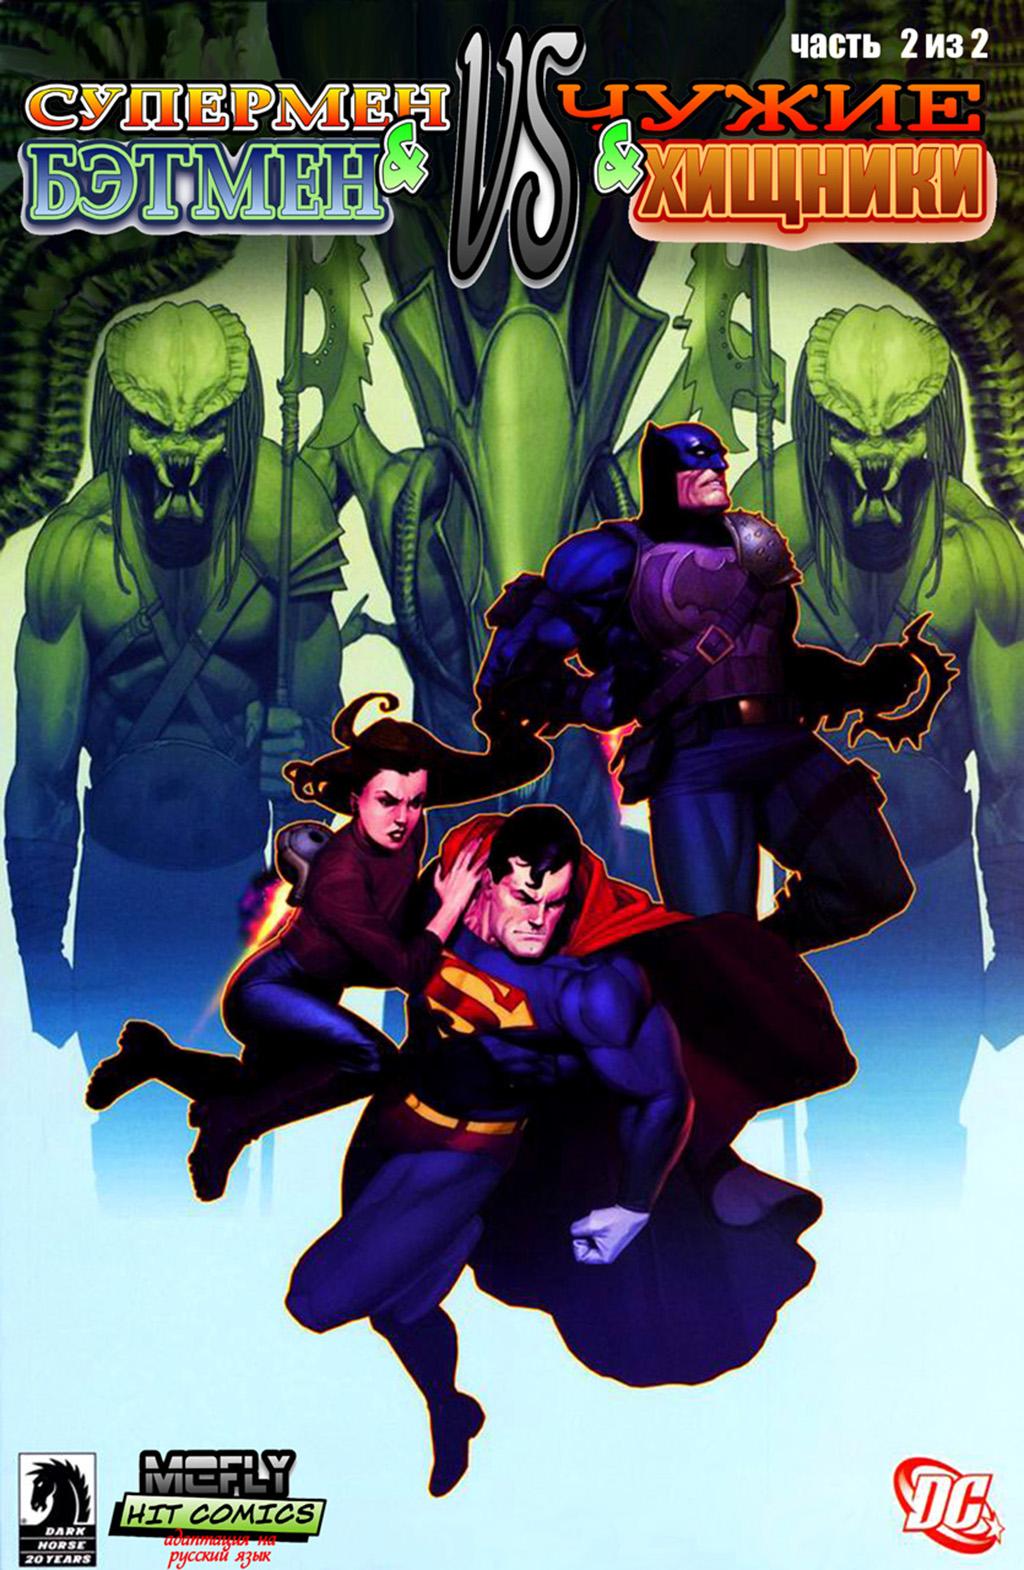 Комикс Супермен и Бэтмен против Чужого и Хищника